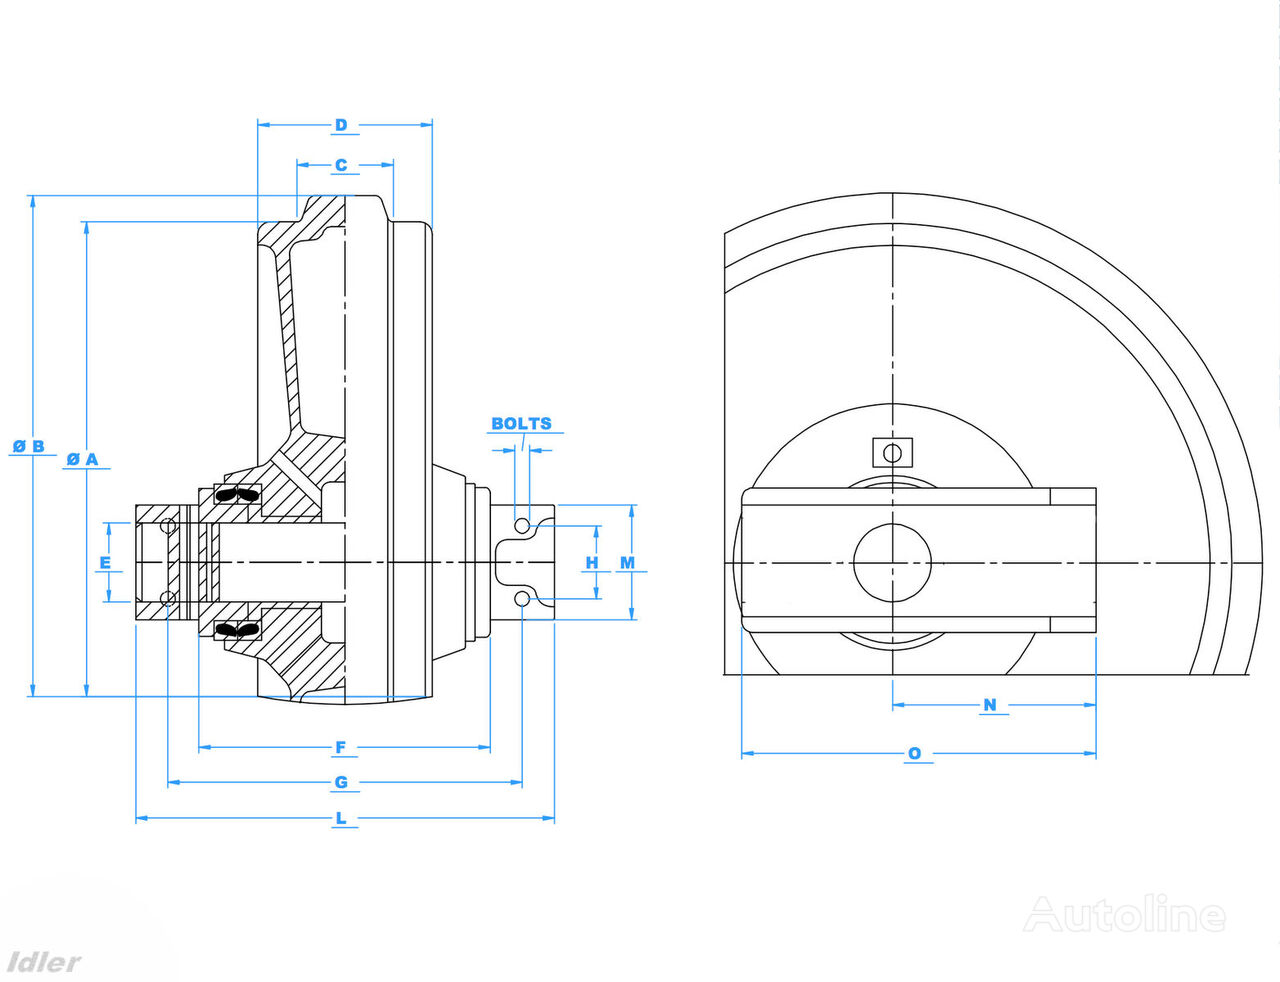 JSB lenivec spare parts for JCB 220 excavator